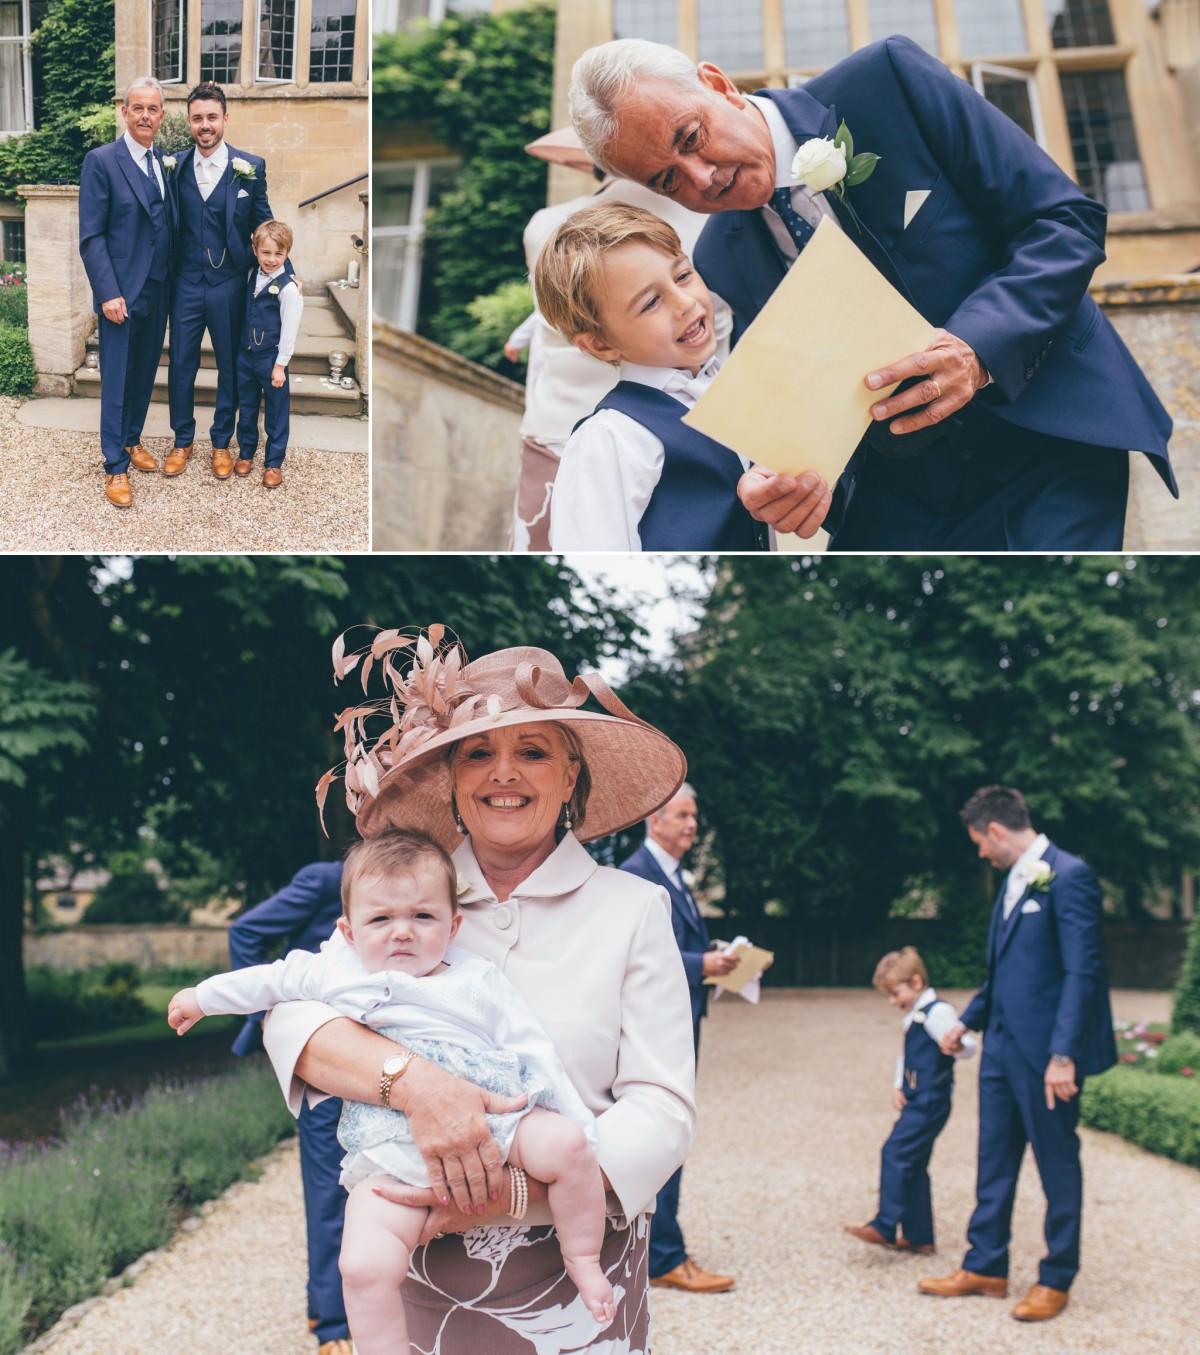 welsh_wedding_photographer_rachel_lambert_photography_lower_slaughter_manor_house_cotswolds_harriet_dean_ 7